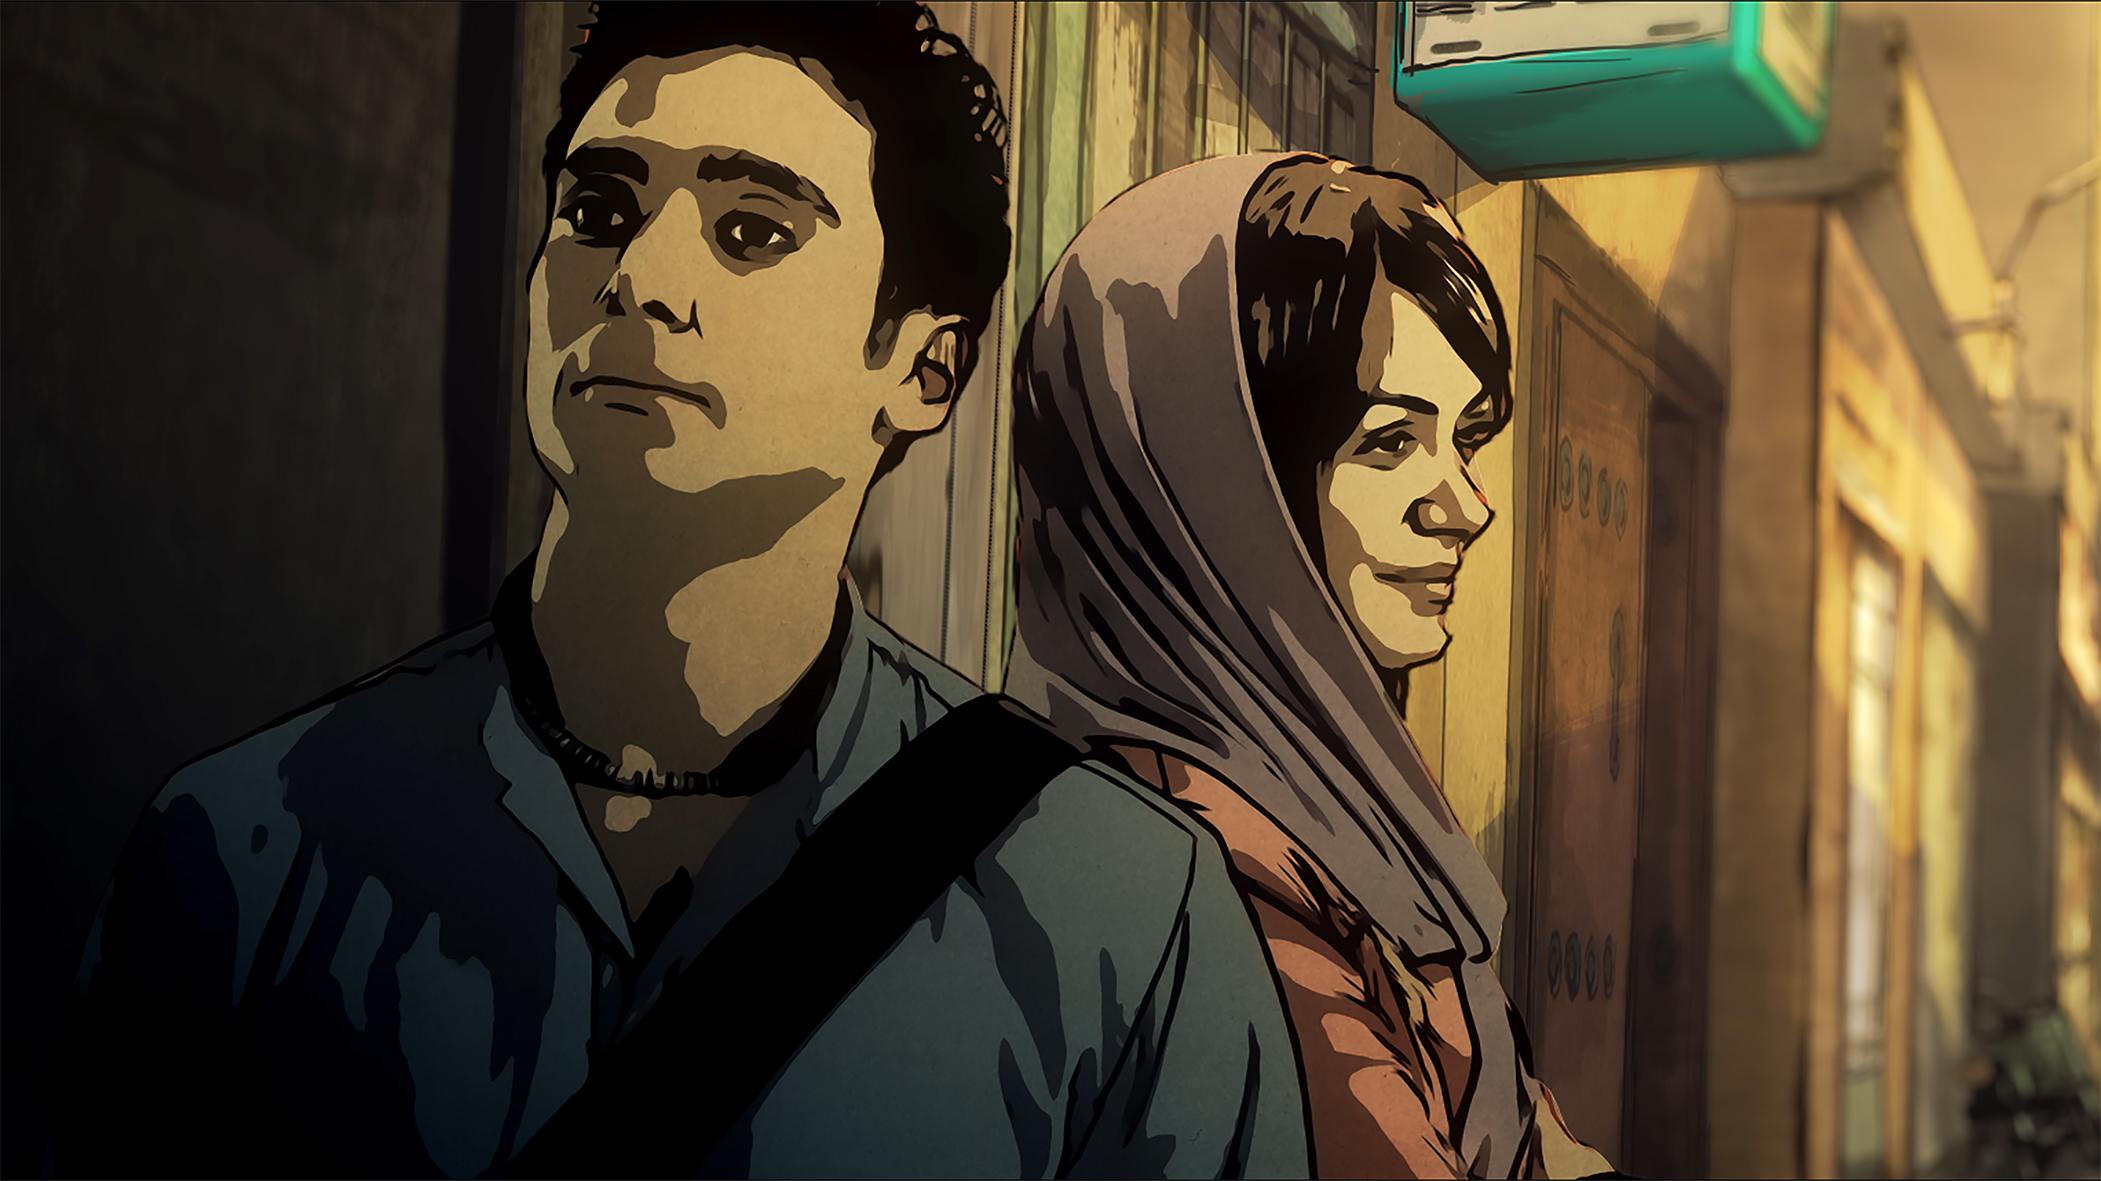 Téhéran tabou – Femme tais-toi